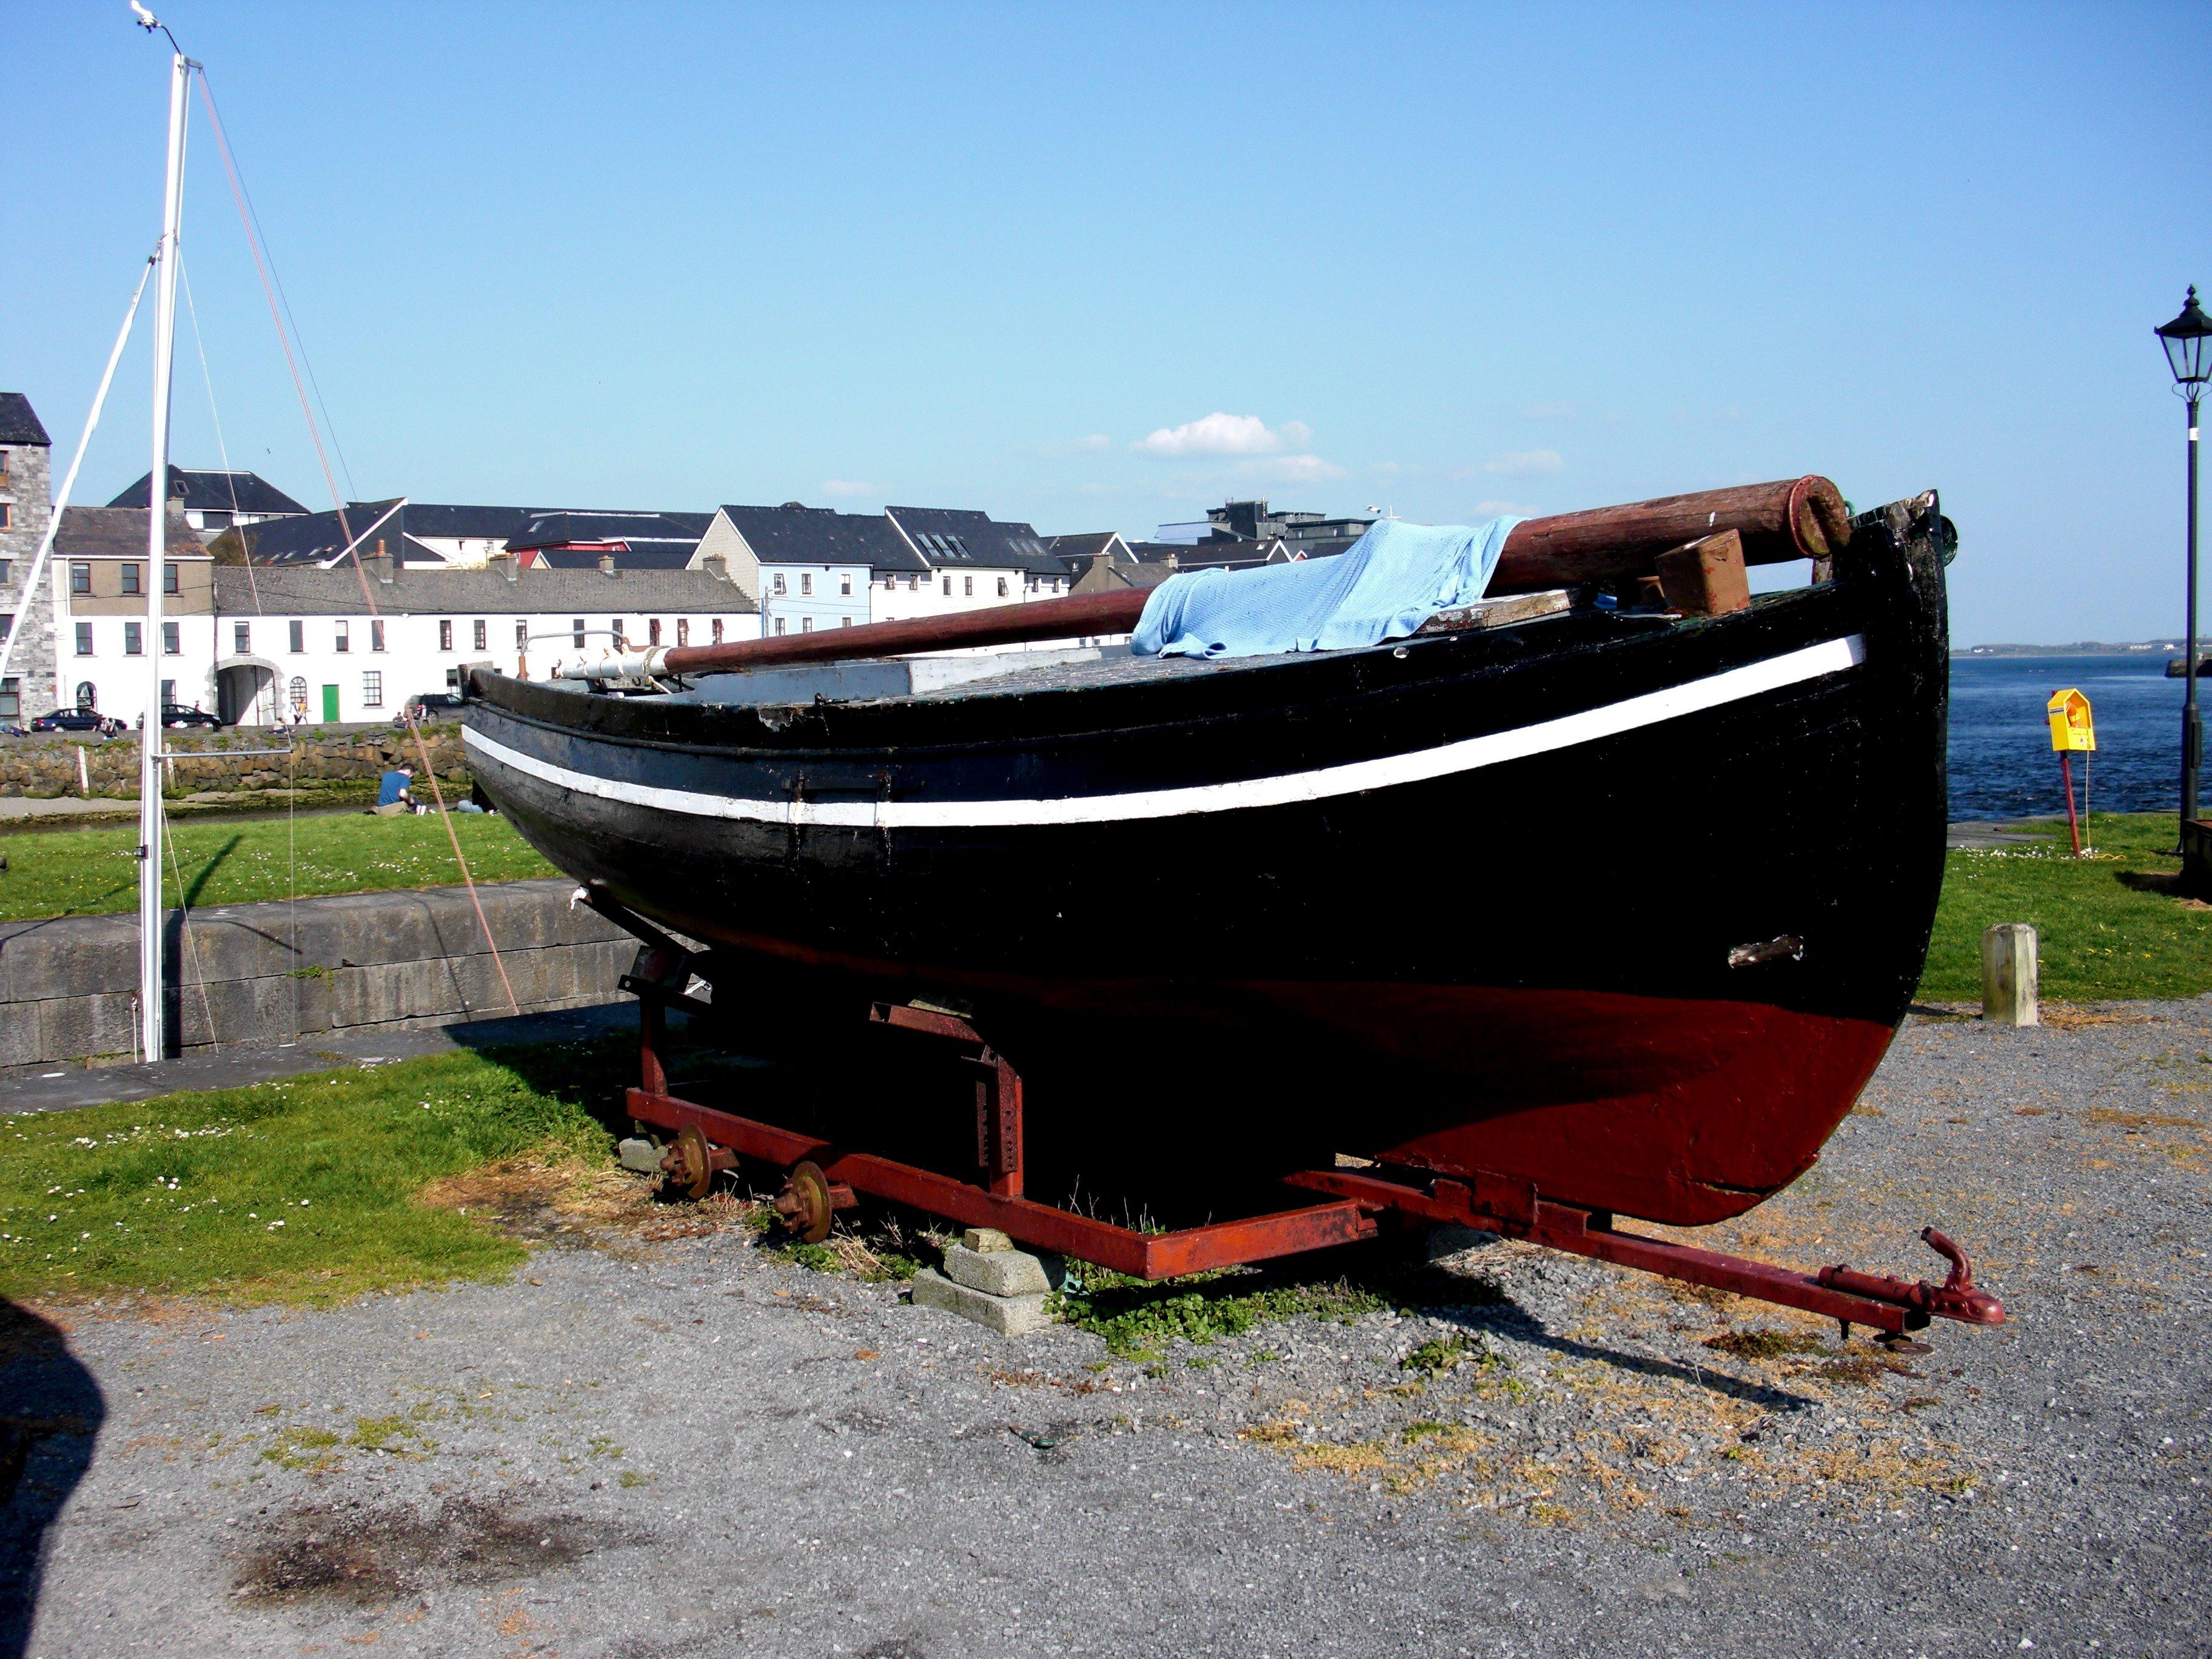 Galway Hooker - Fishing Vessel, Boats, Fish, Fisherman, Fishing, HQ Photo